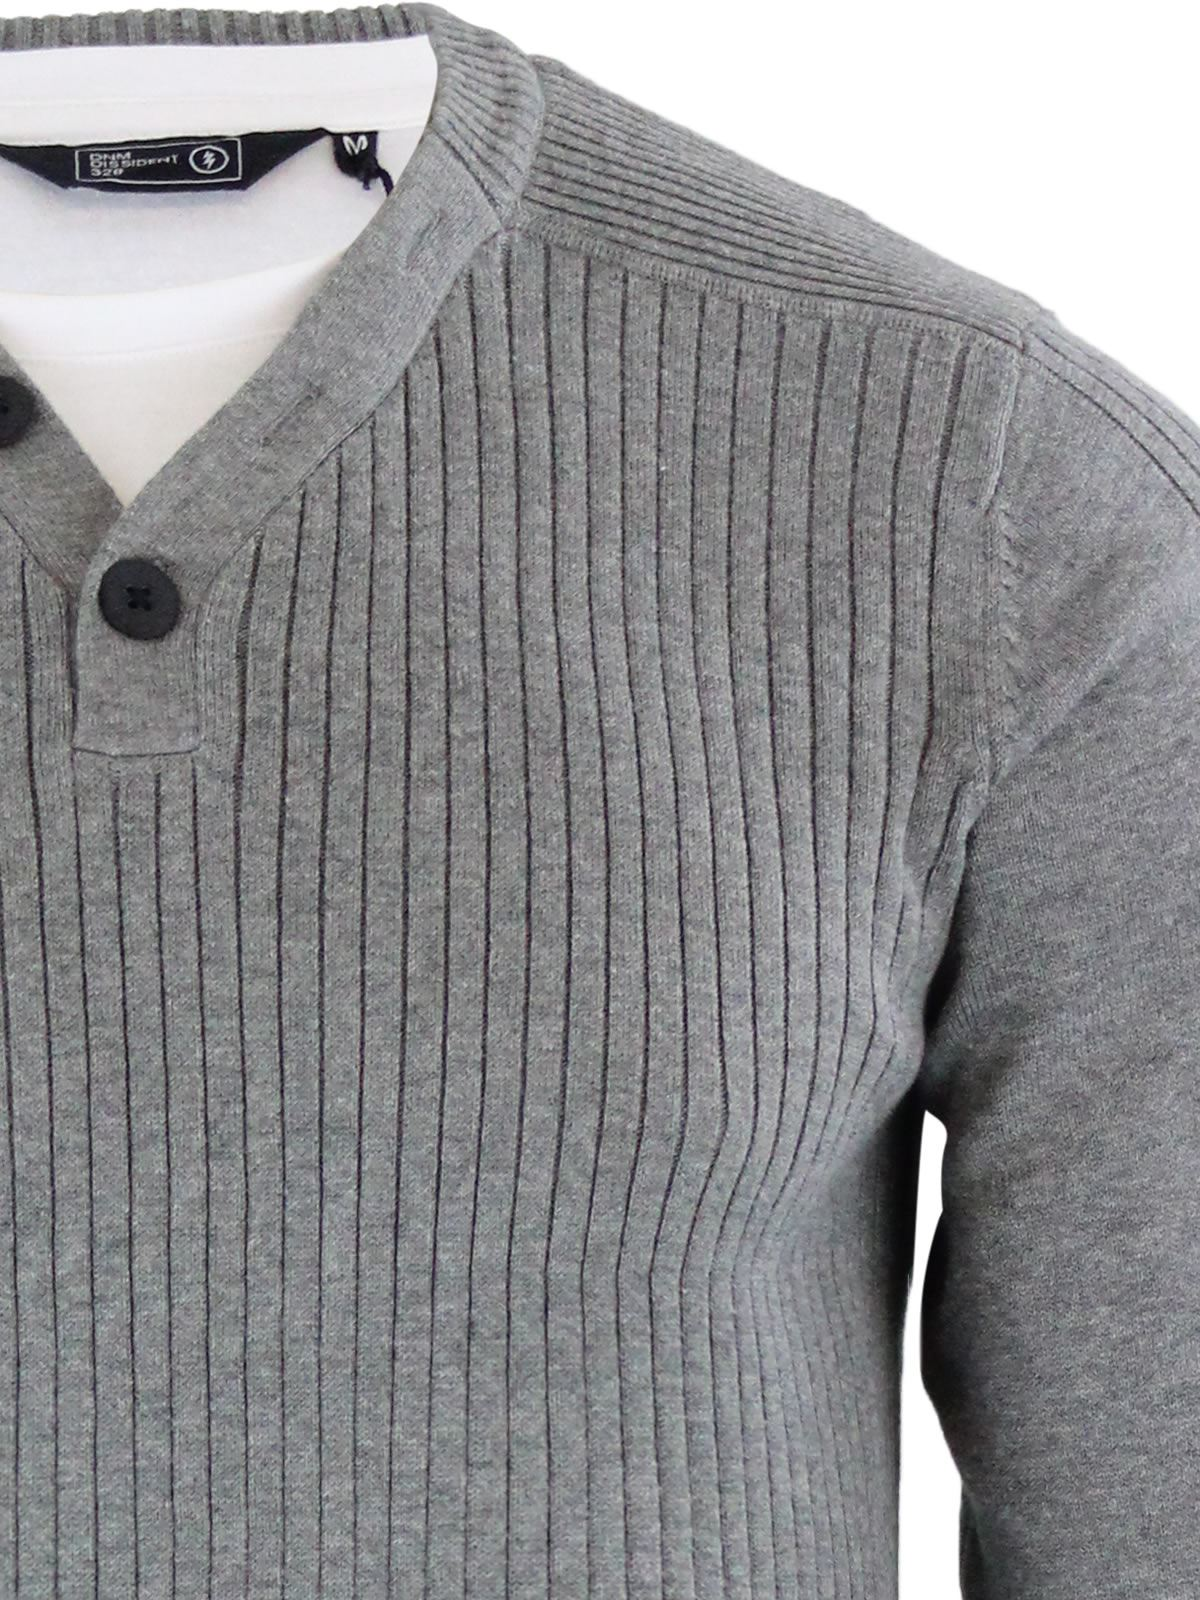 Mens Jumper Dissident Barnes Y-Neck Mock Inner Pull Over Sweater